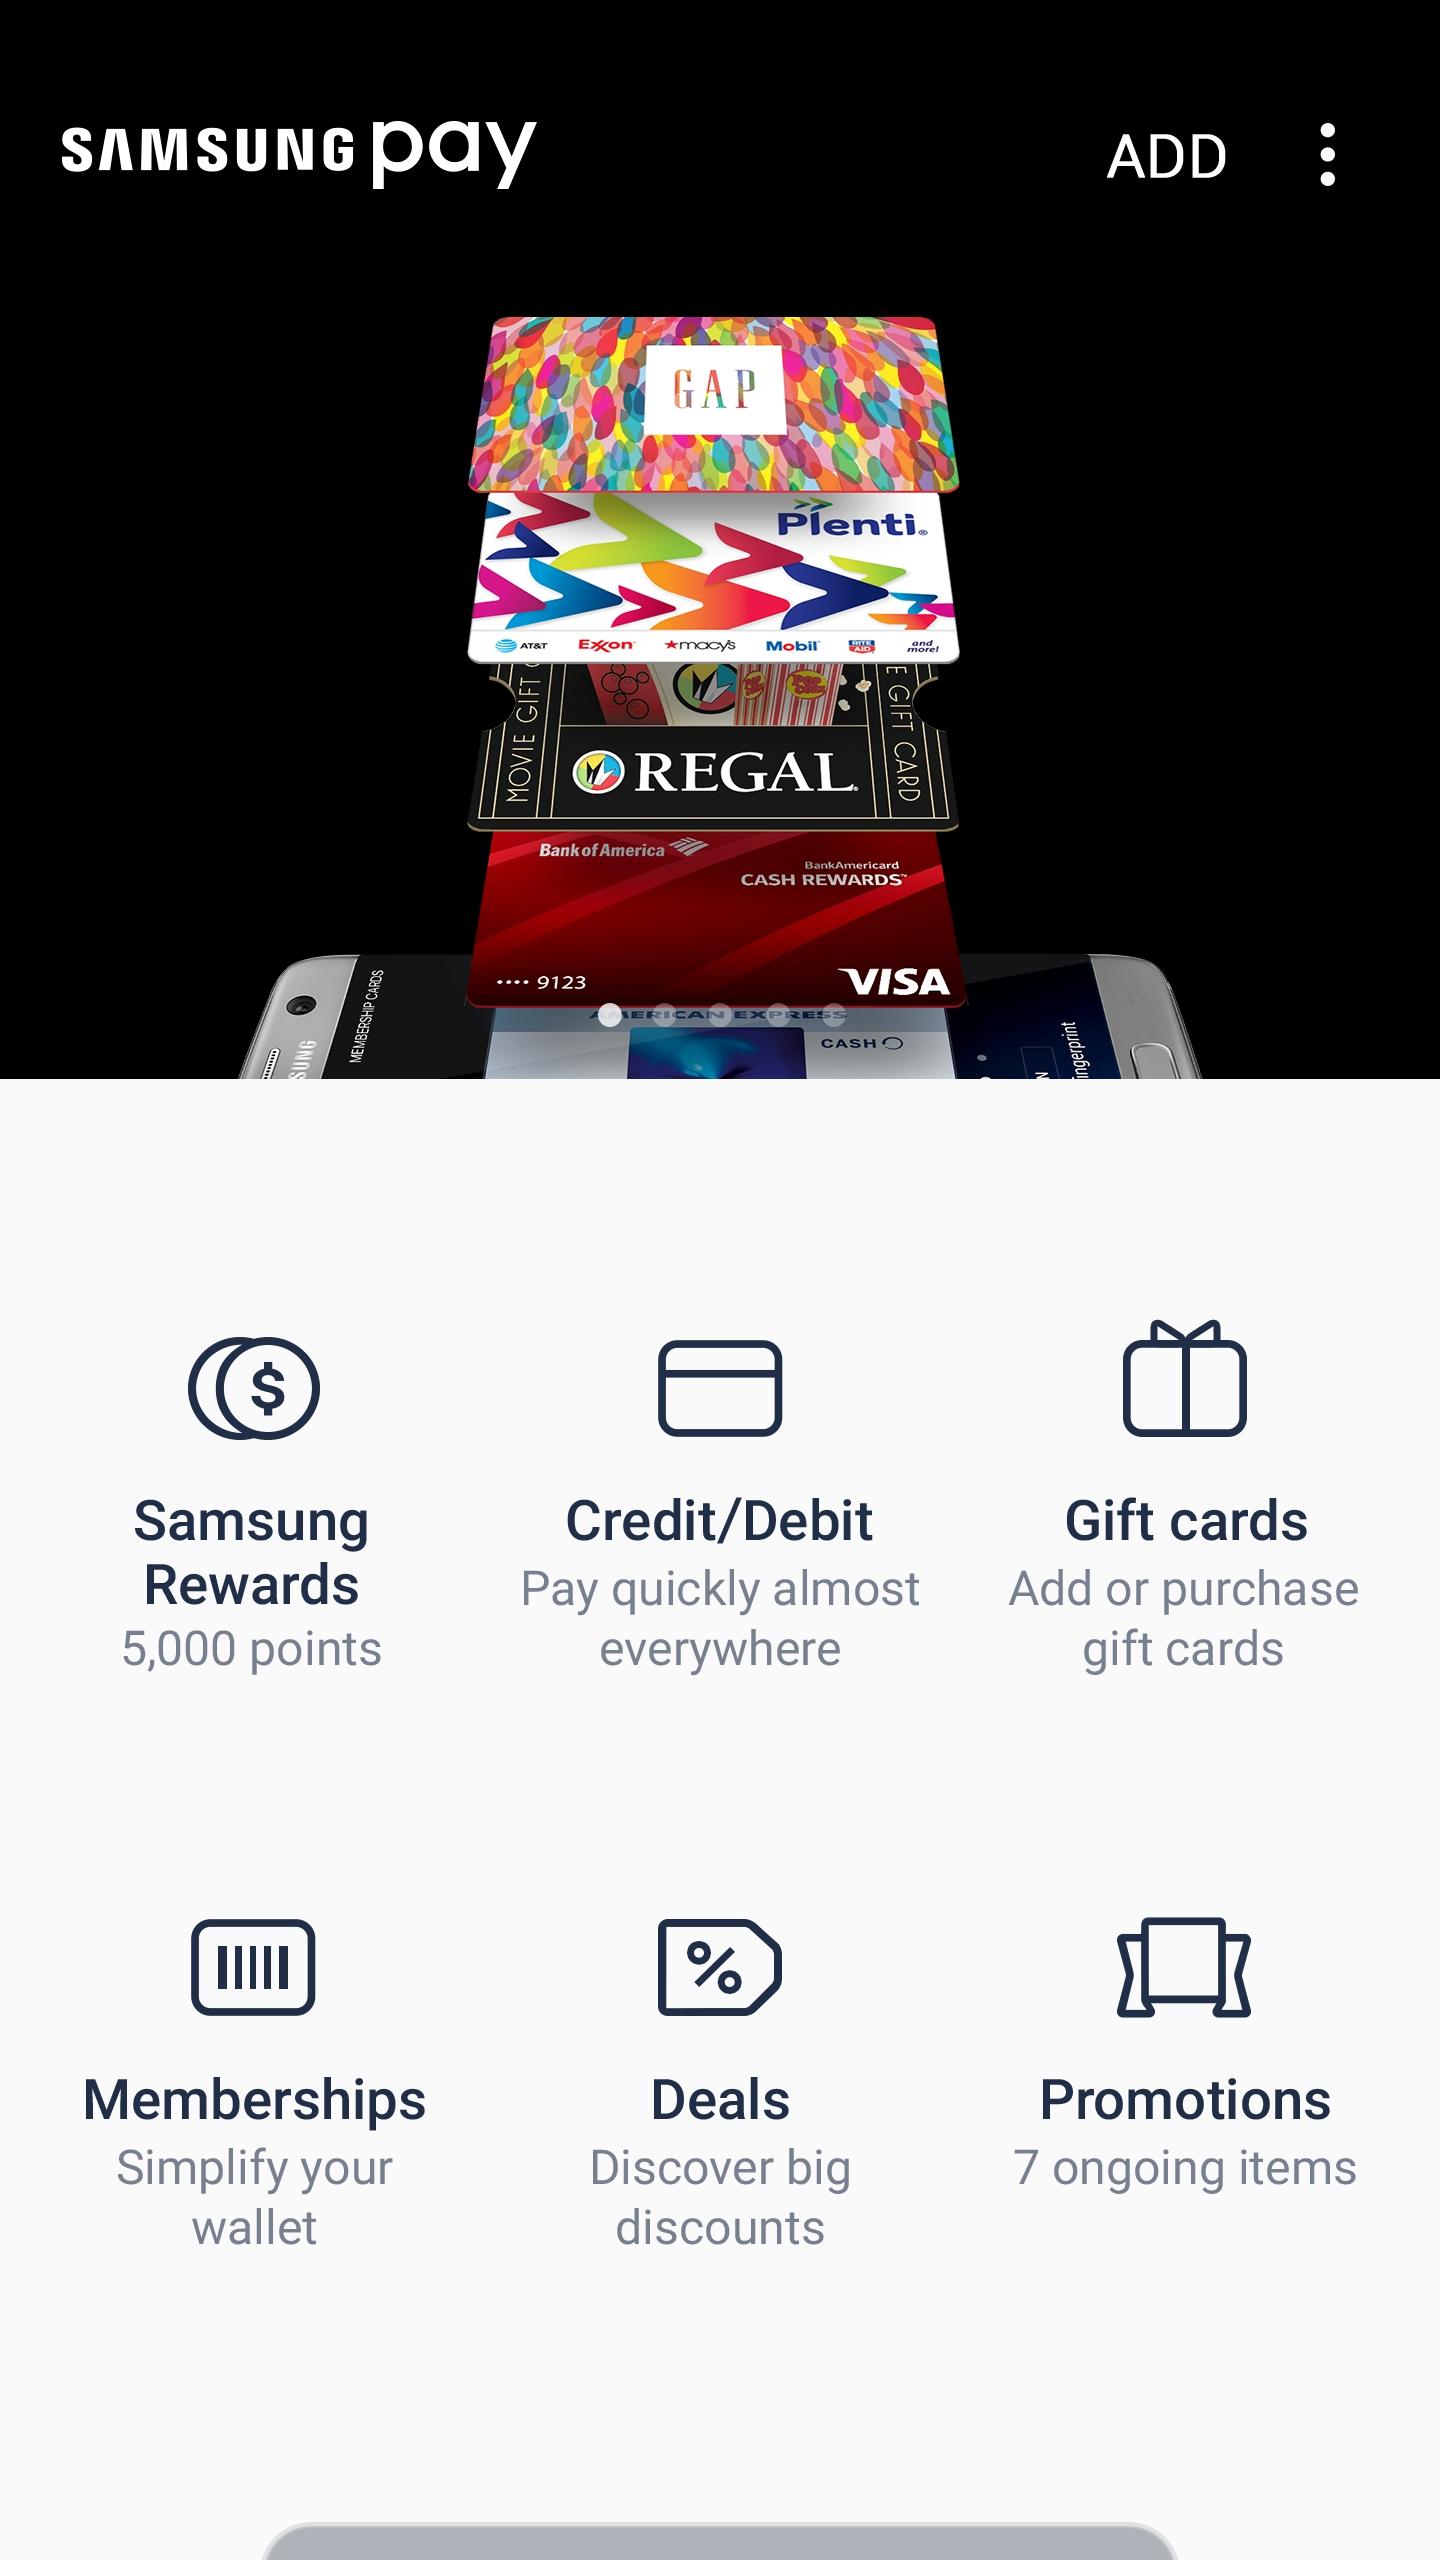 Samsung Pay Announces \'Samsung Rewards\' Program, First-of-its-Kind ...